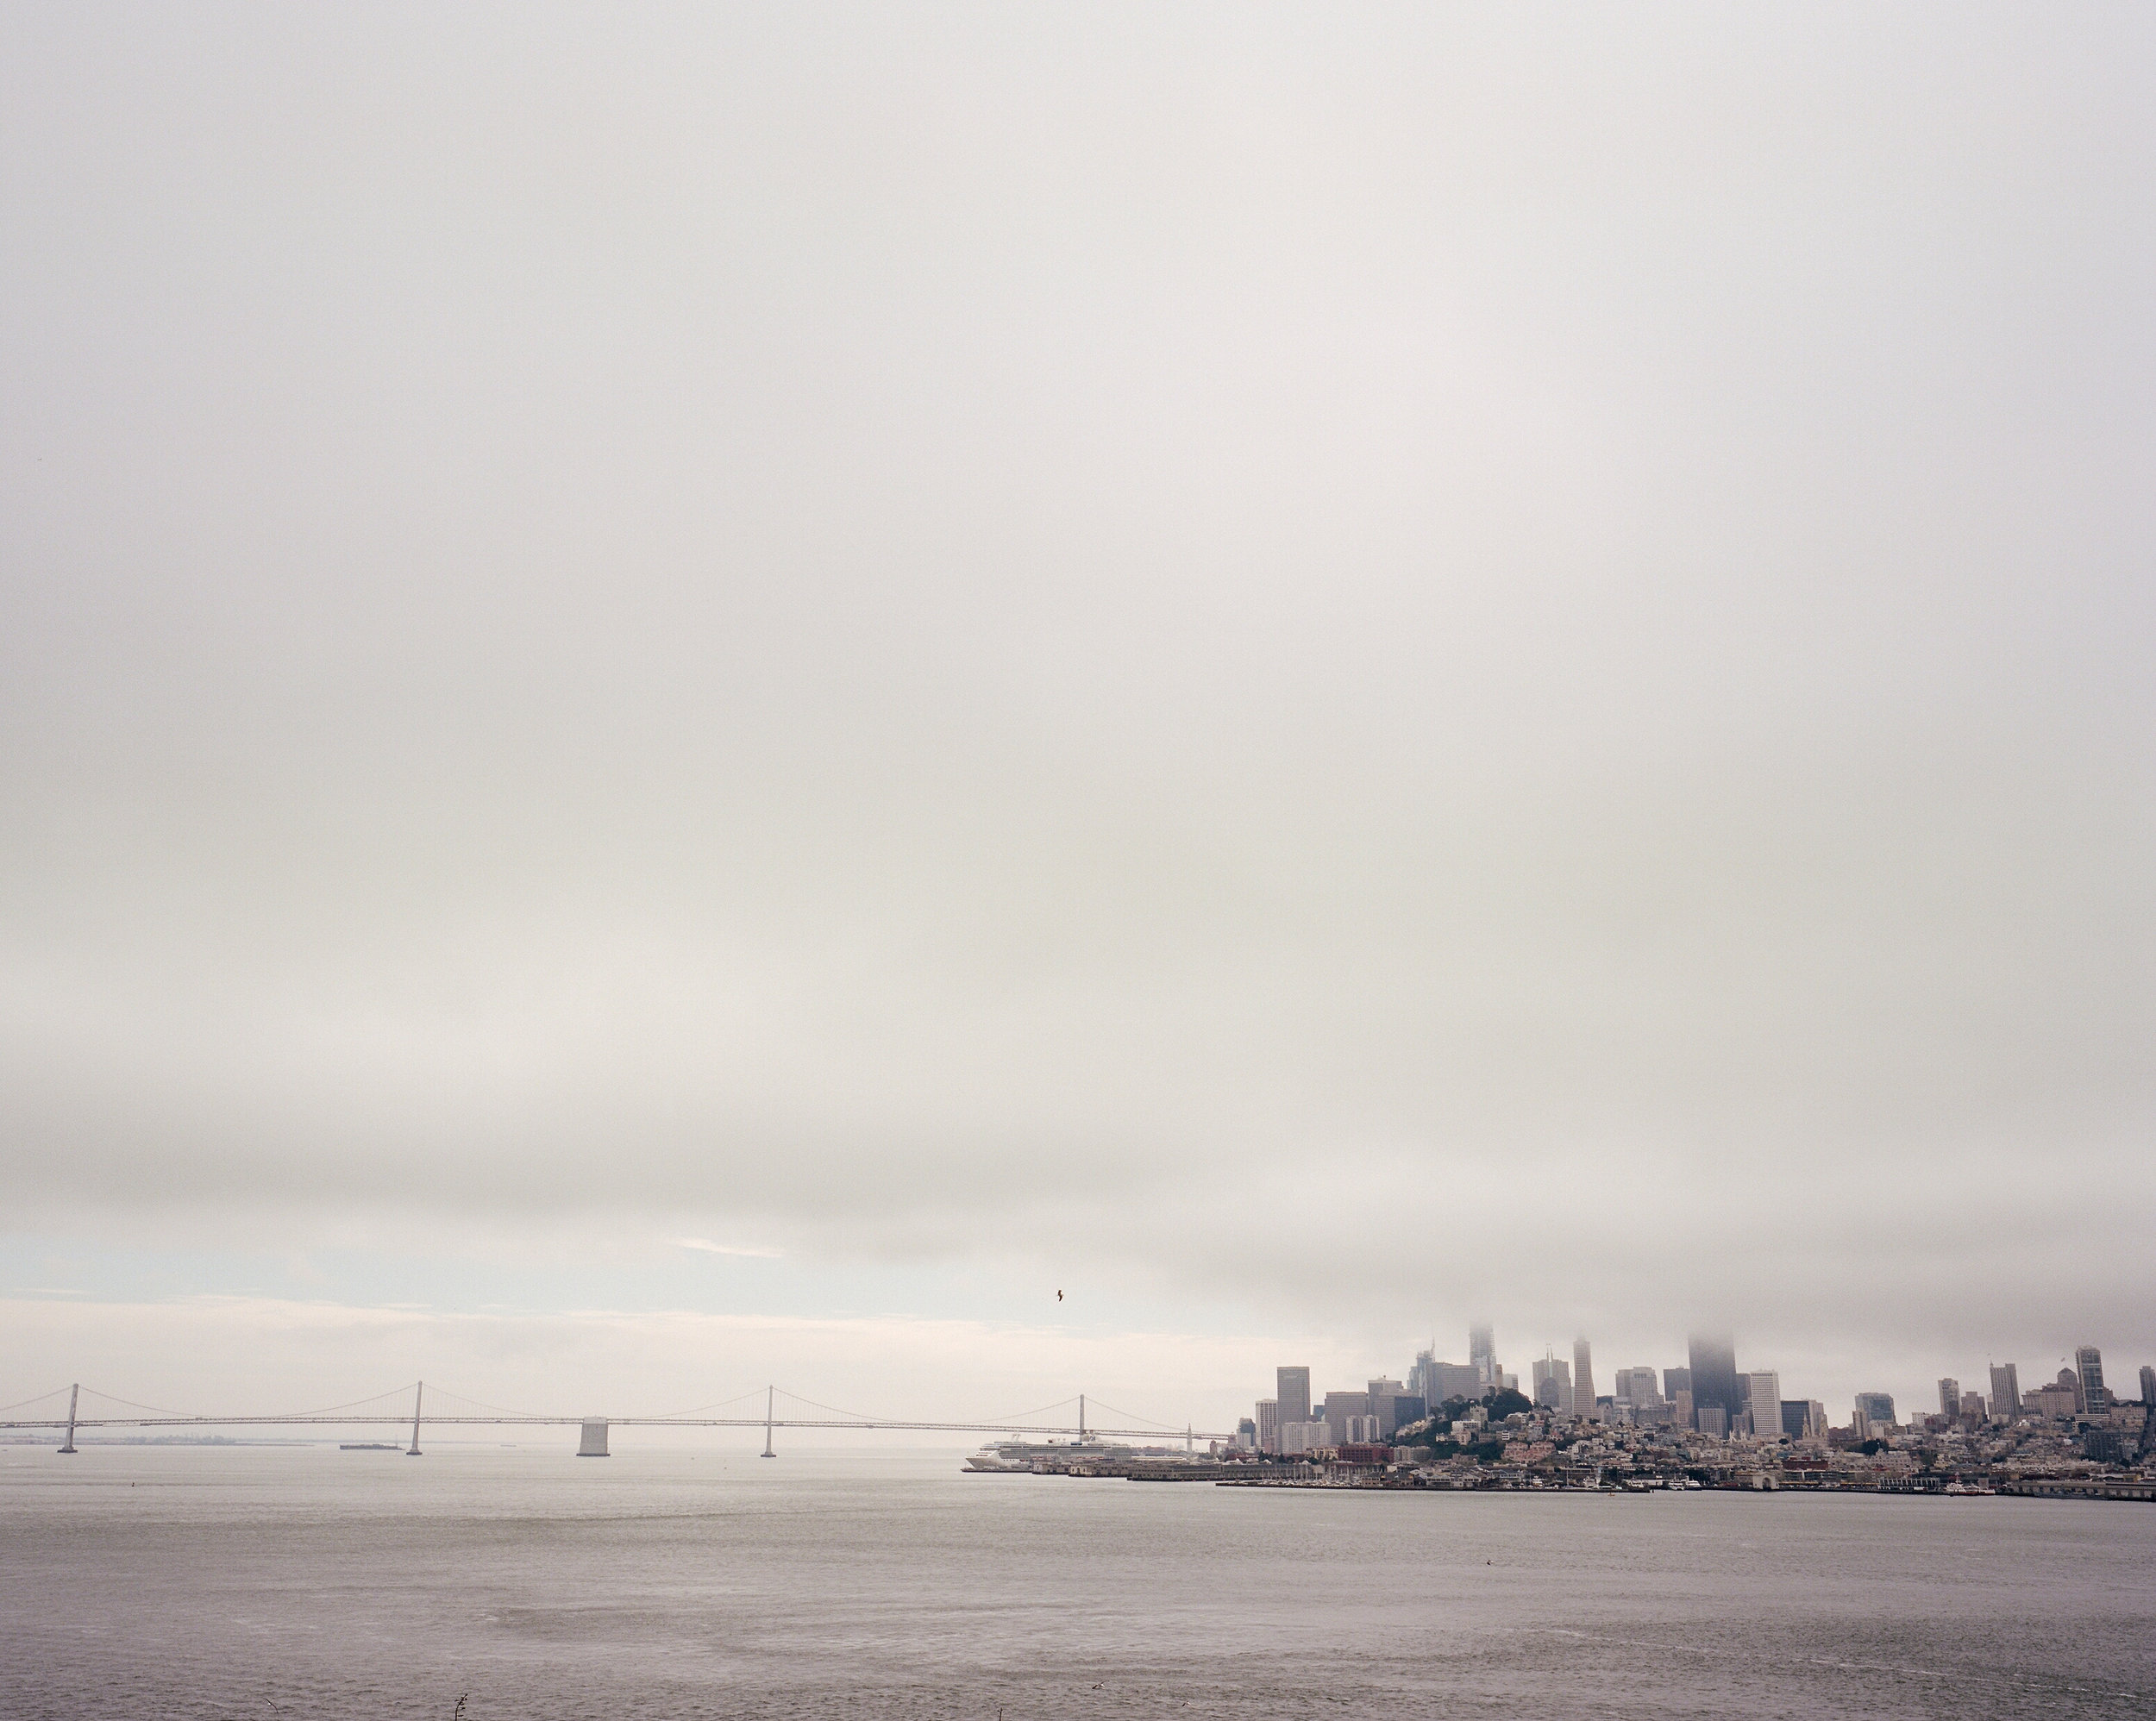 Frame 3   The Bay Bridge leading into San Francisco